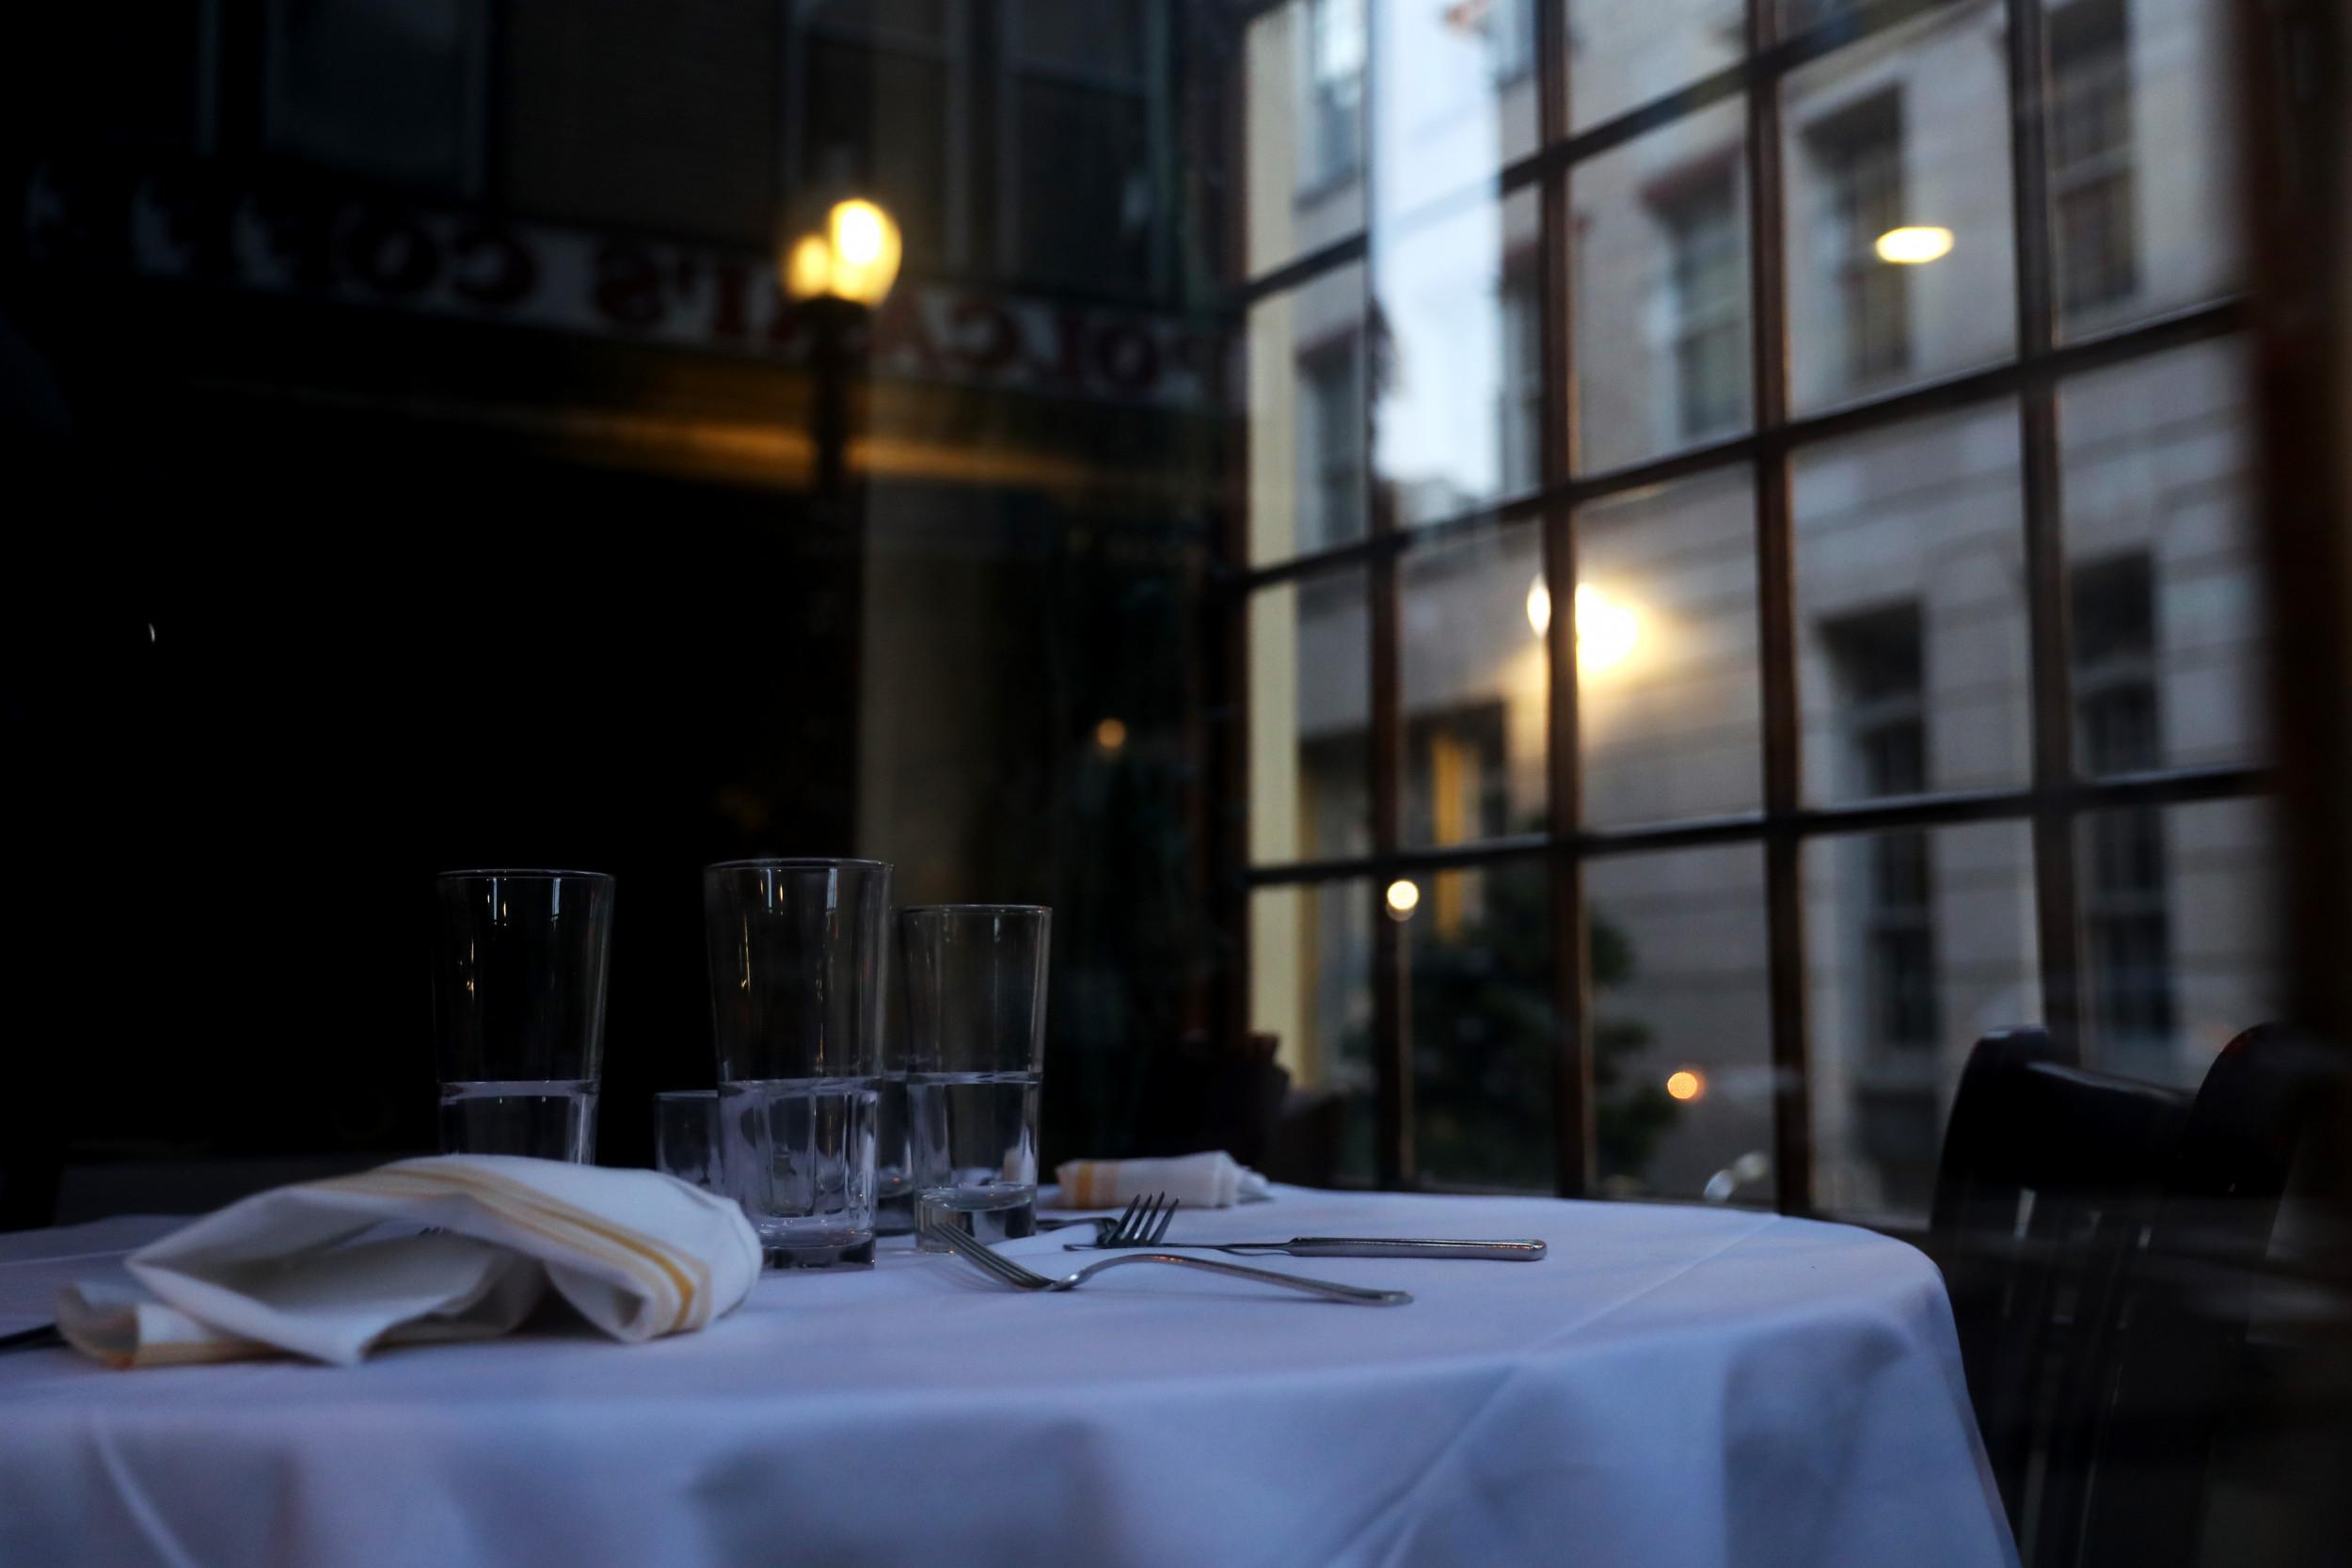 newsweek.com - Soo Kim - Restaurant where GOP leaders broke COVID guidelines may be sanctioned